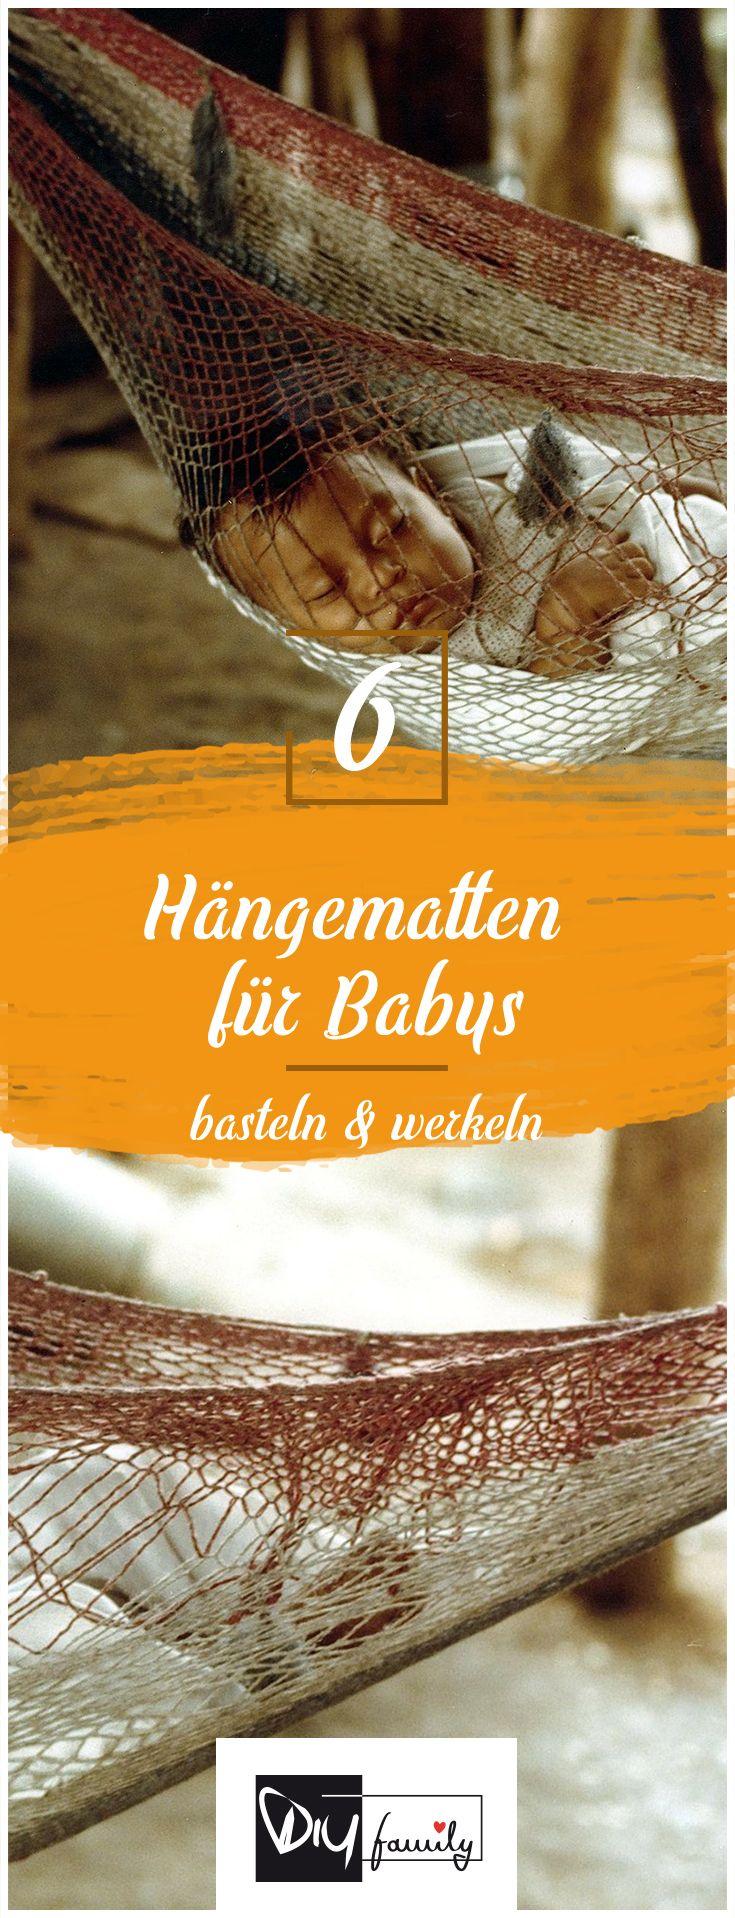 best 25+ baby hängematte ideas on pinterest, Gartengerate ideen